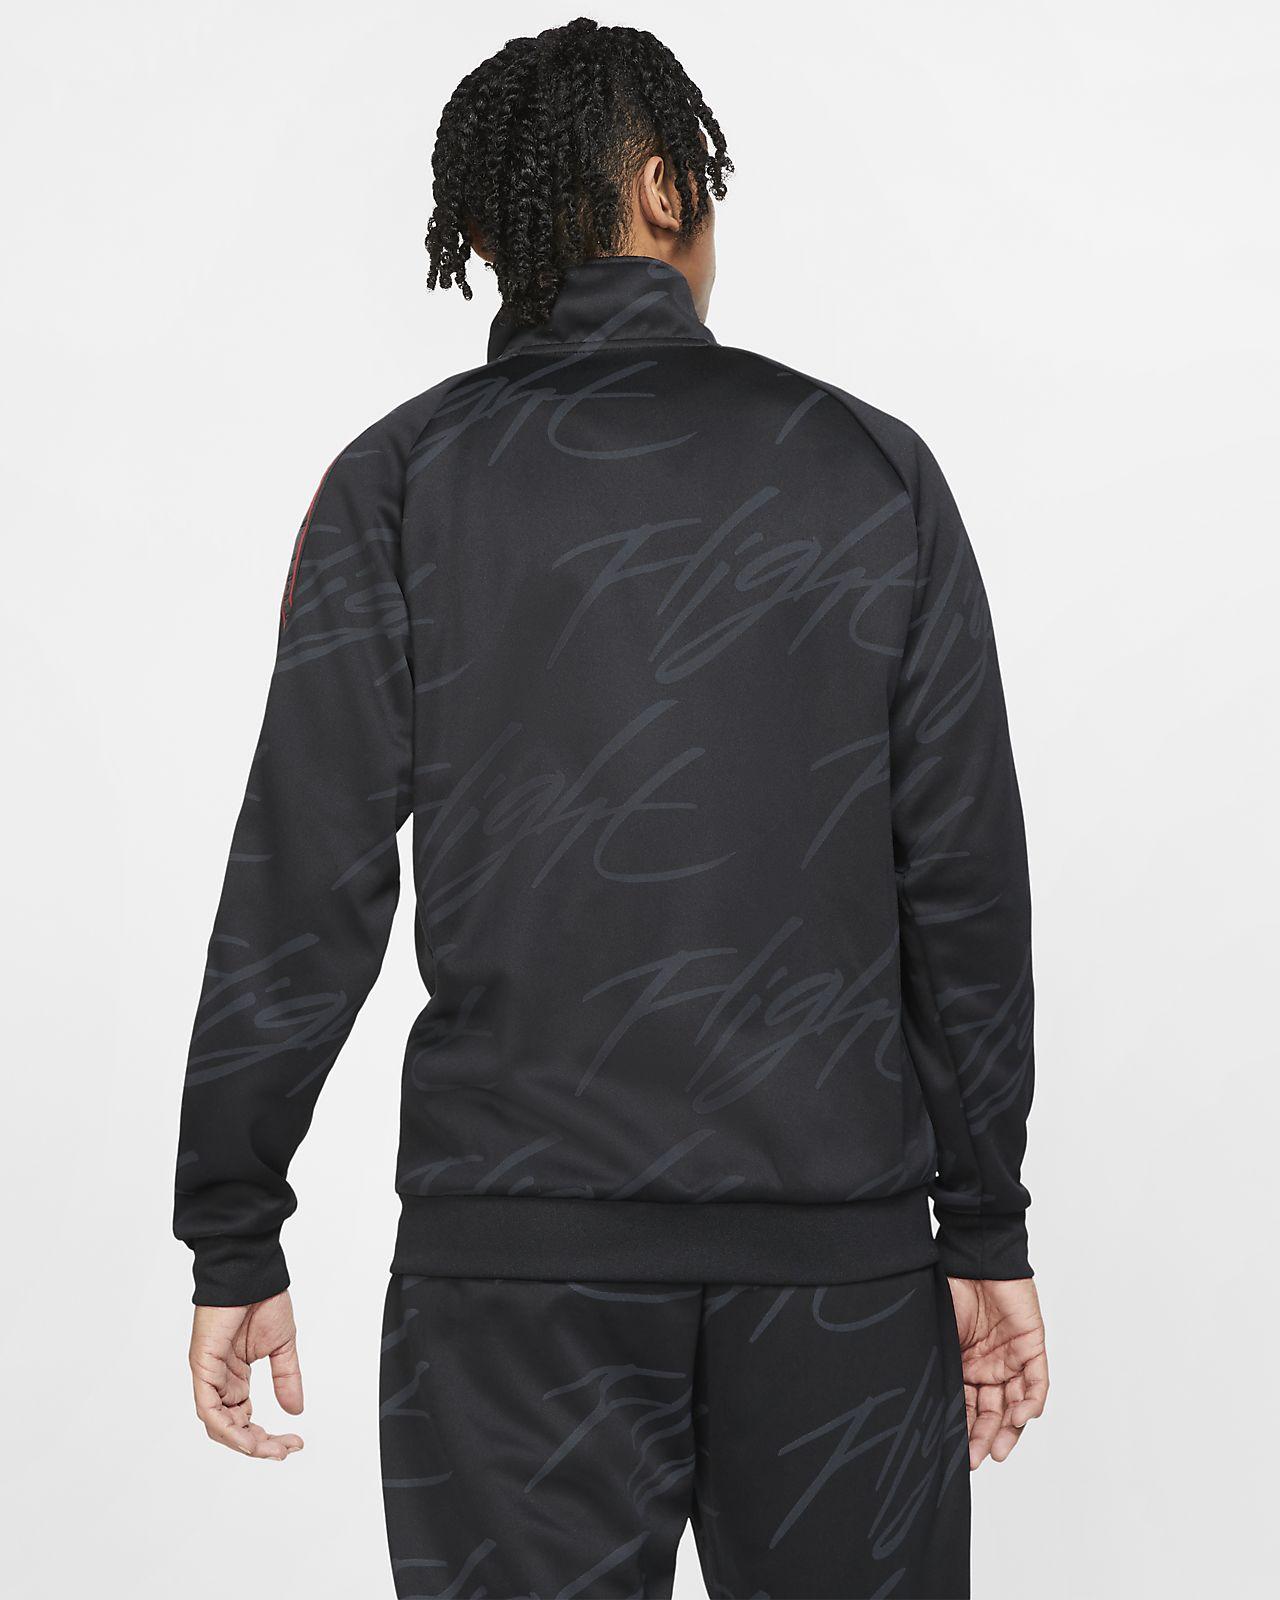 dbbaaa97ccf7 Jordan Jumpman Tricot Men s Graphic Jacket. Nike.com CA